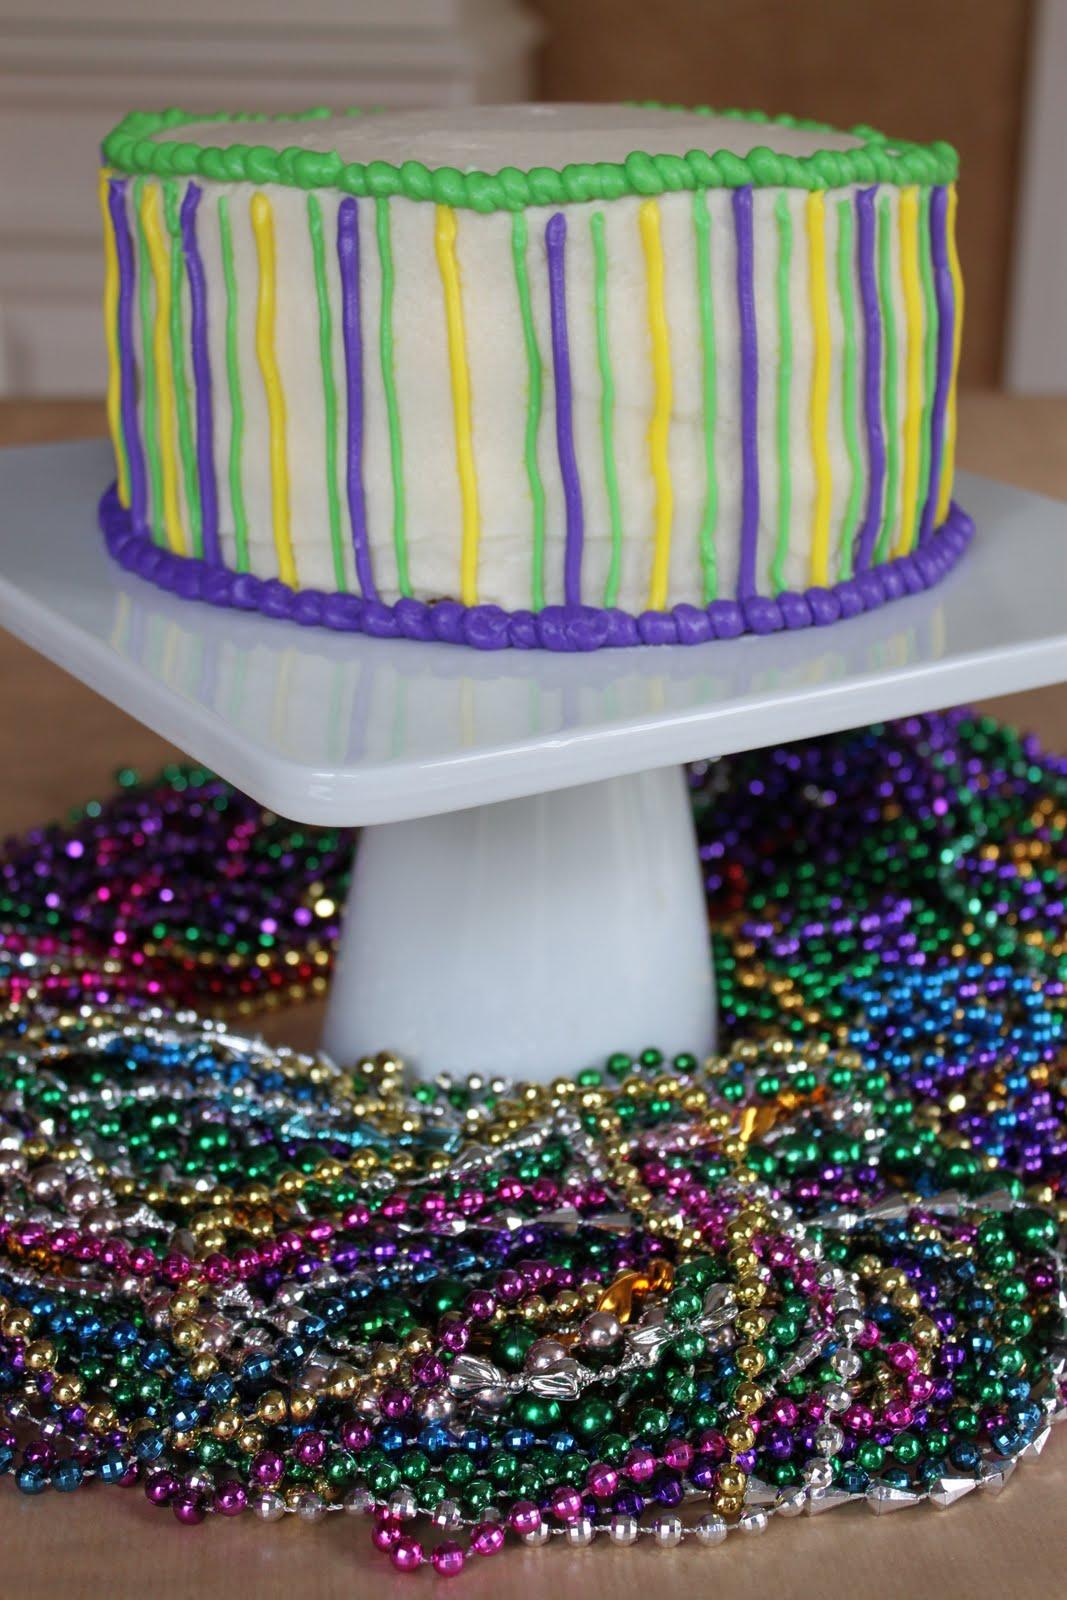 Crave indulge satisfy mardi gras king cake inspired layer cake mardi gras king cake inspired layer cake arubaitofo Choice Image